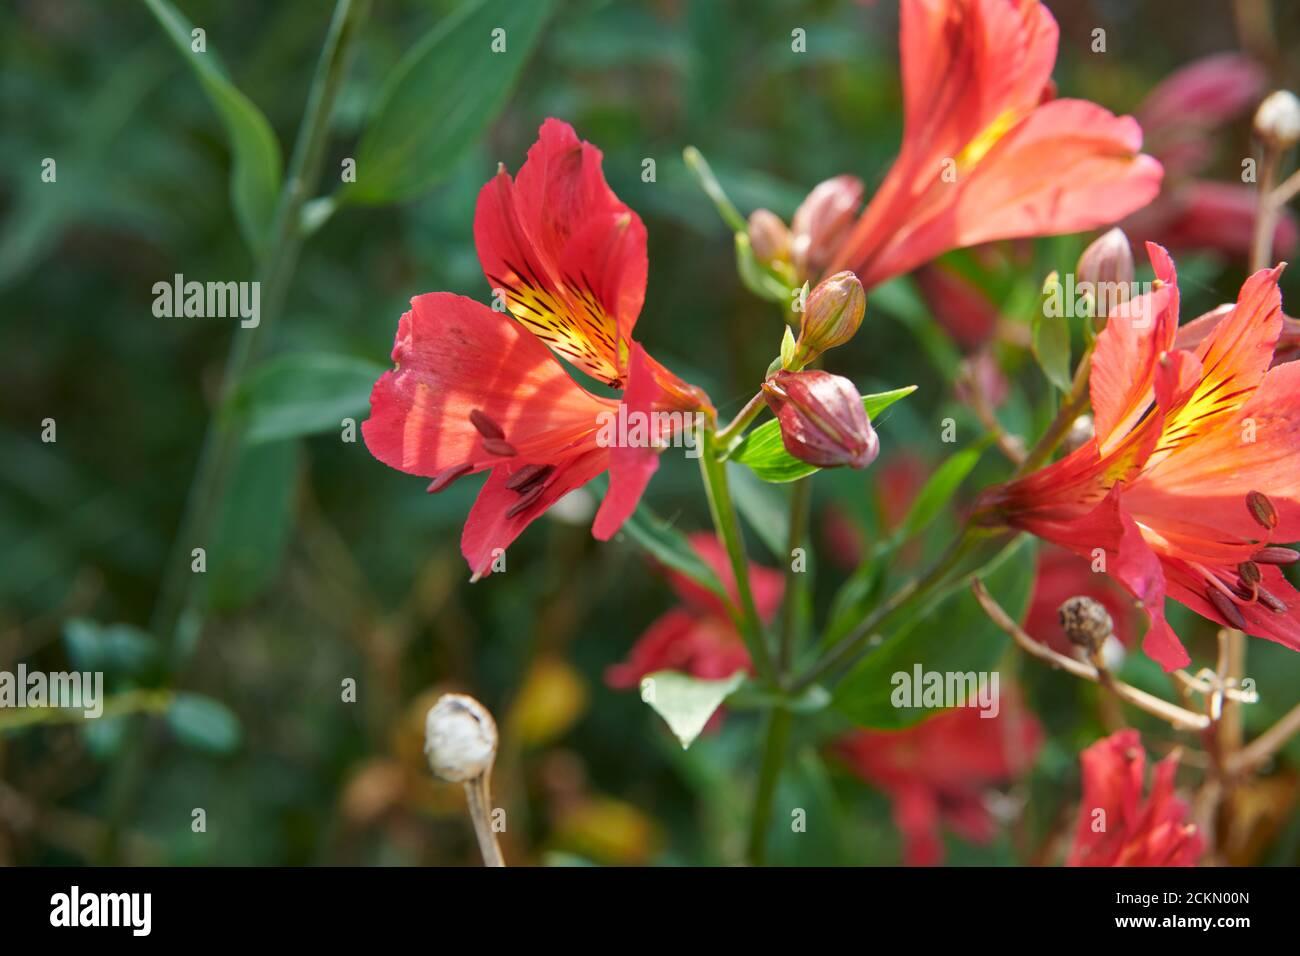 Peruvian Lily Alstroemeria Aurea In A Summer Garden Border Stock Photo Alamy